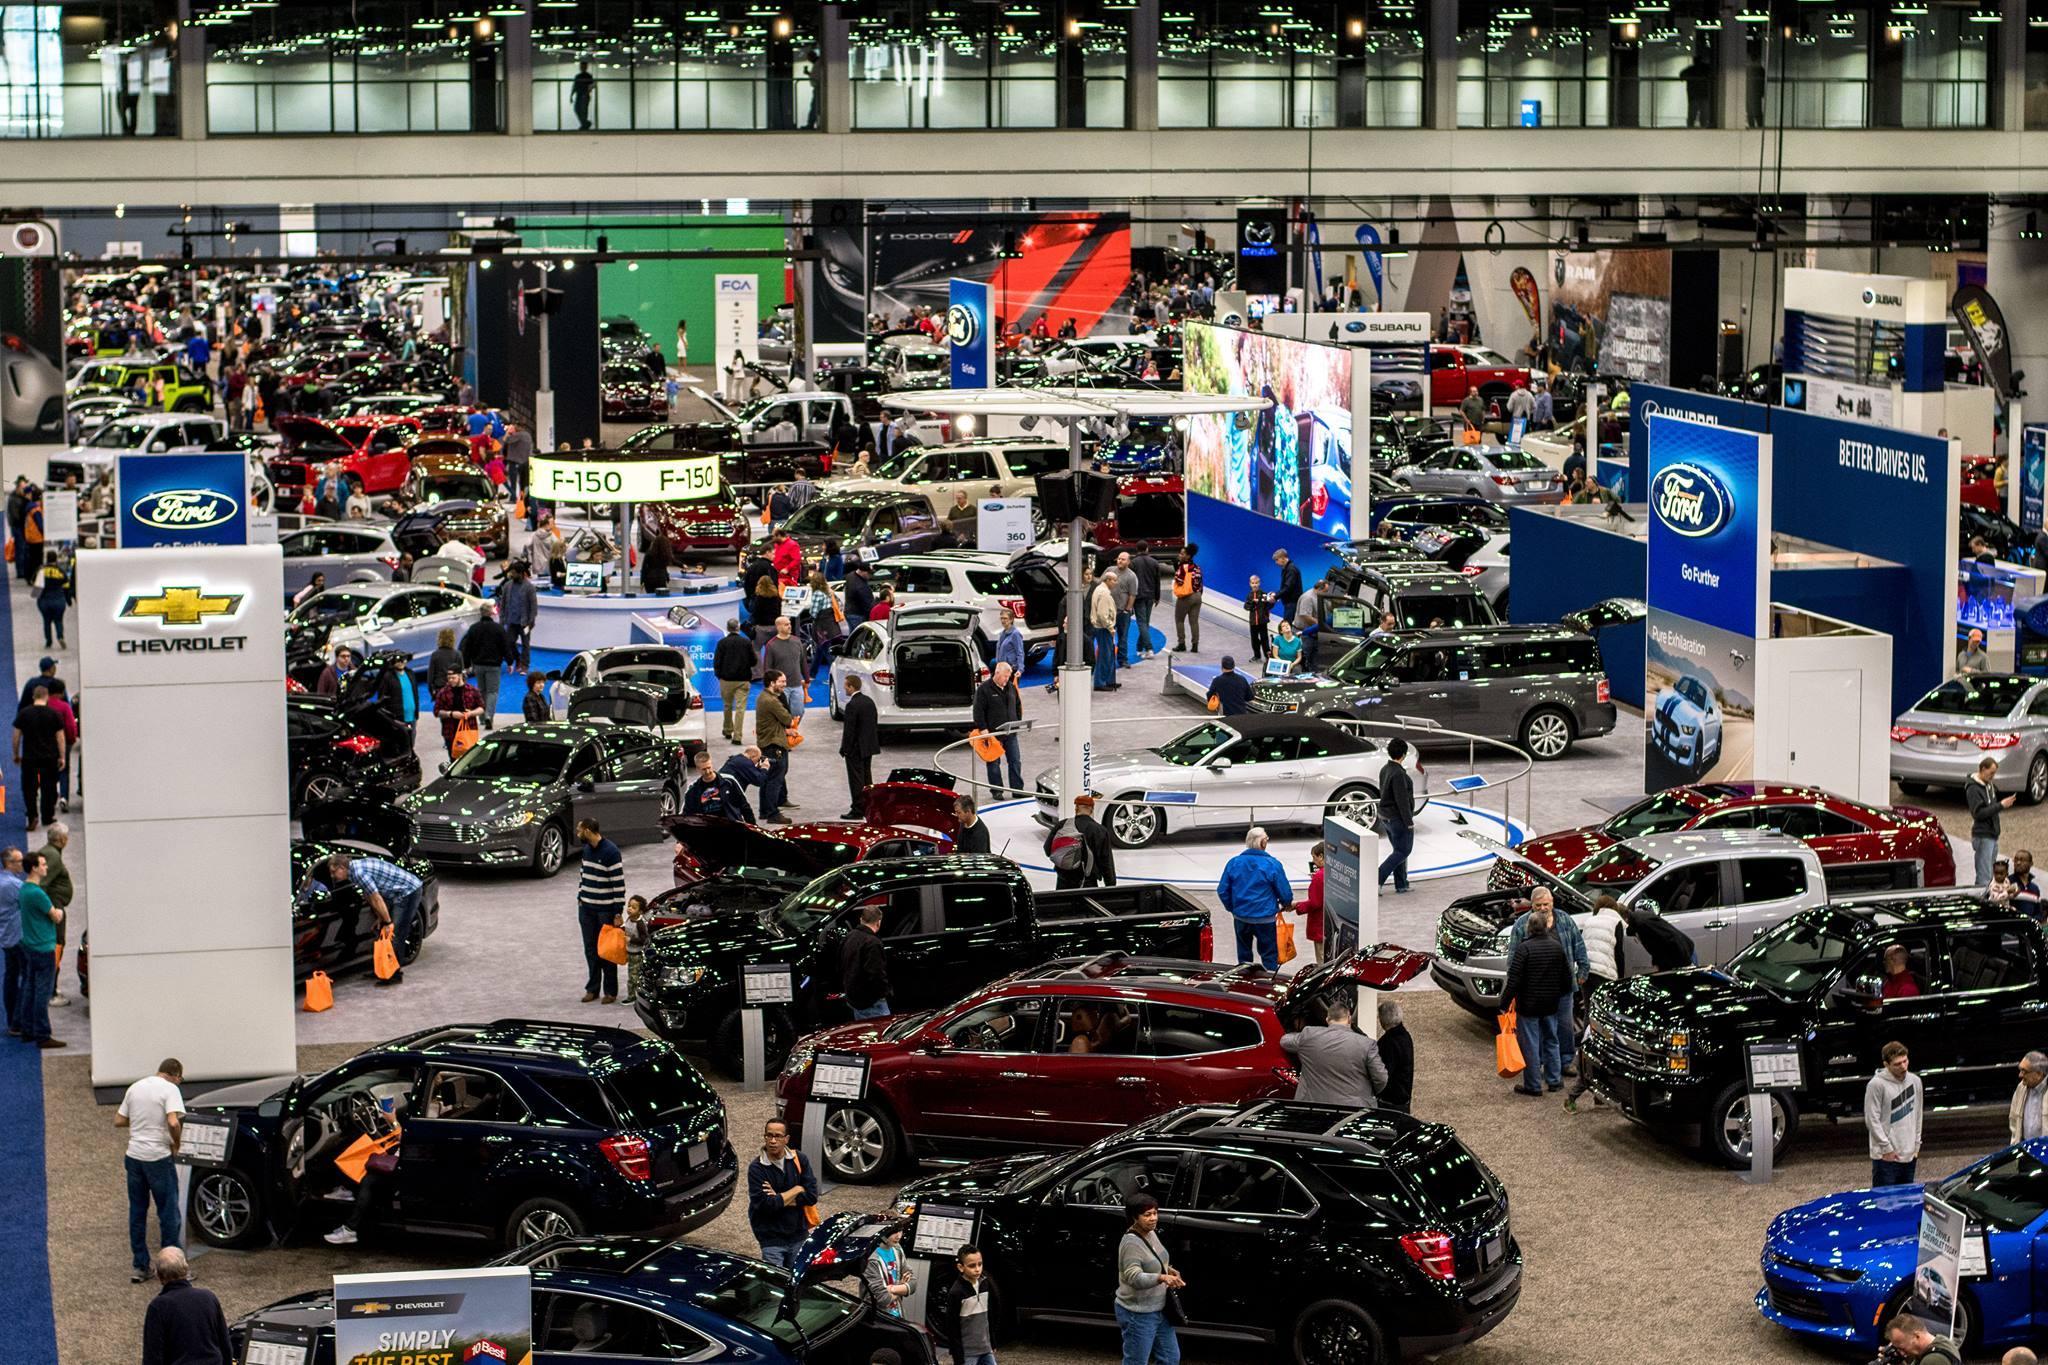 Cincinnati Auto Expo Highlights Industry Trends WVXU - Car show in cincinnati this weekend